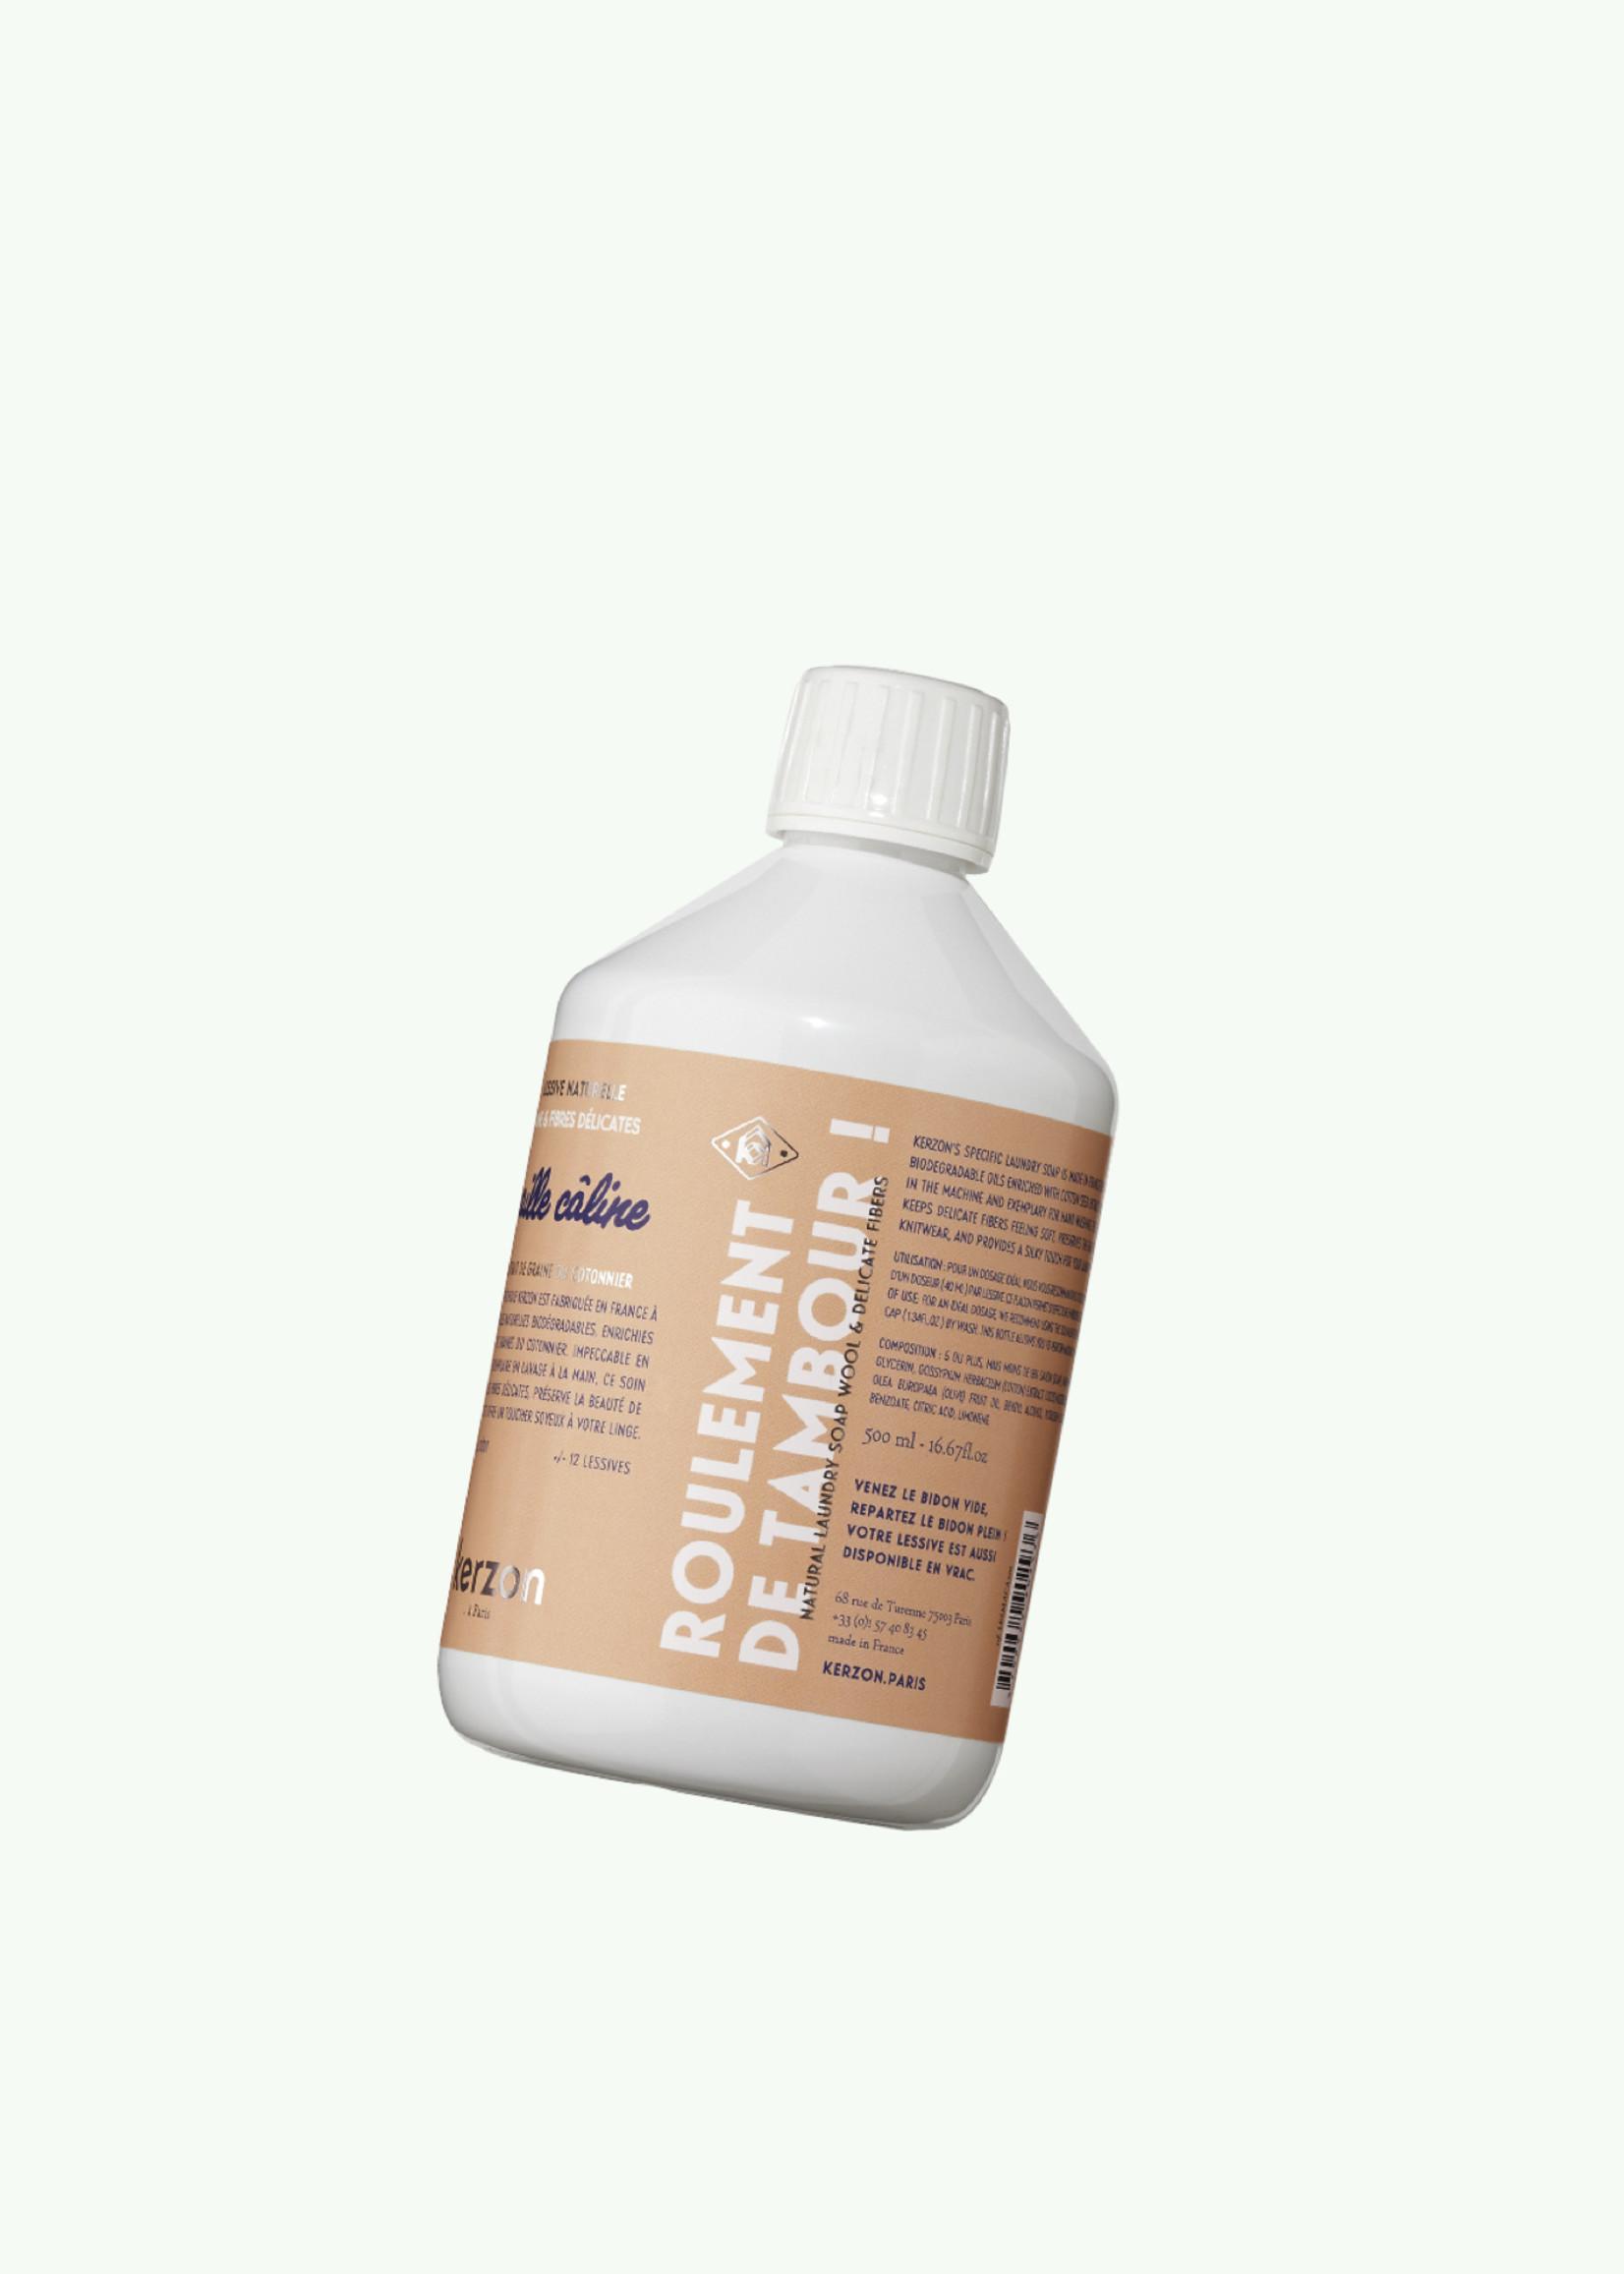 Kerzon Kerzon - Maille Caline - Detergent for wool 500 ml